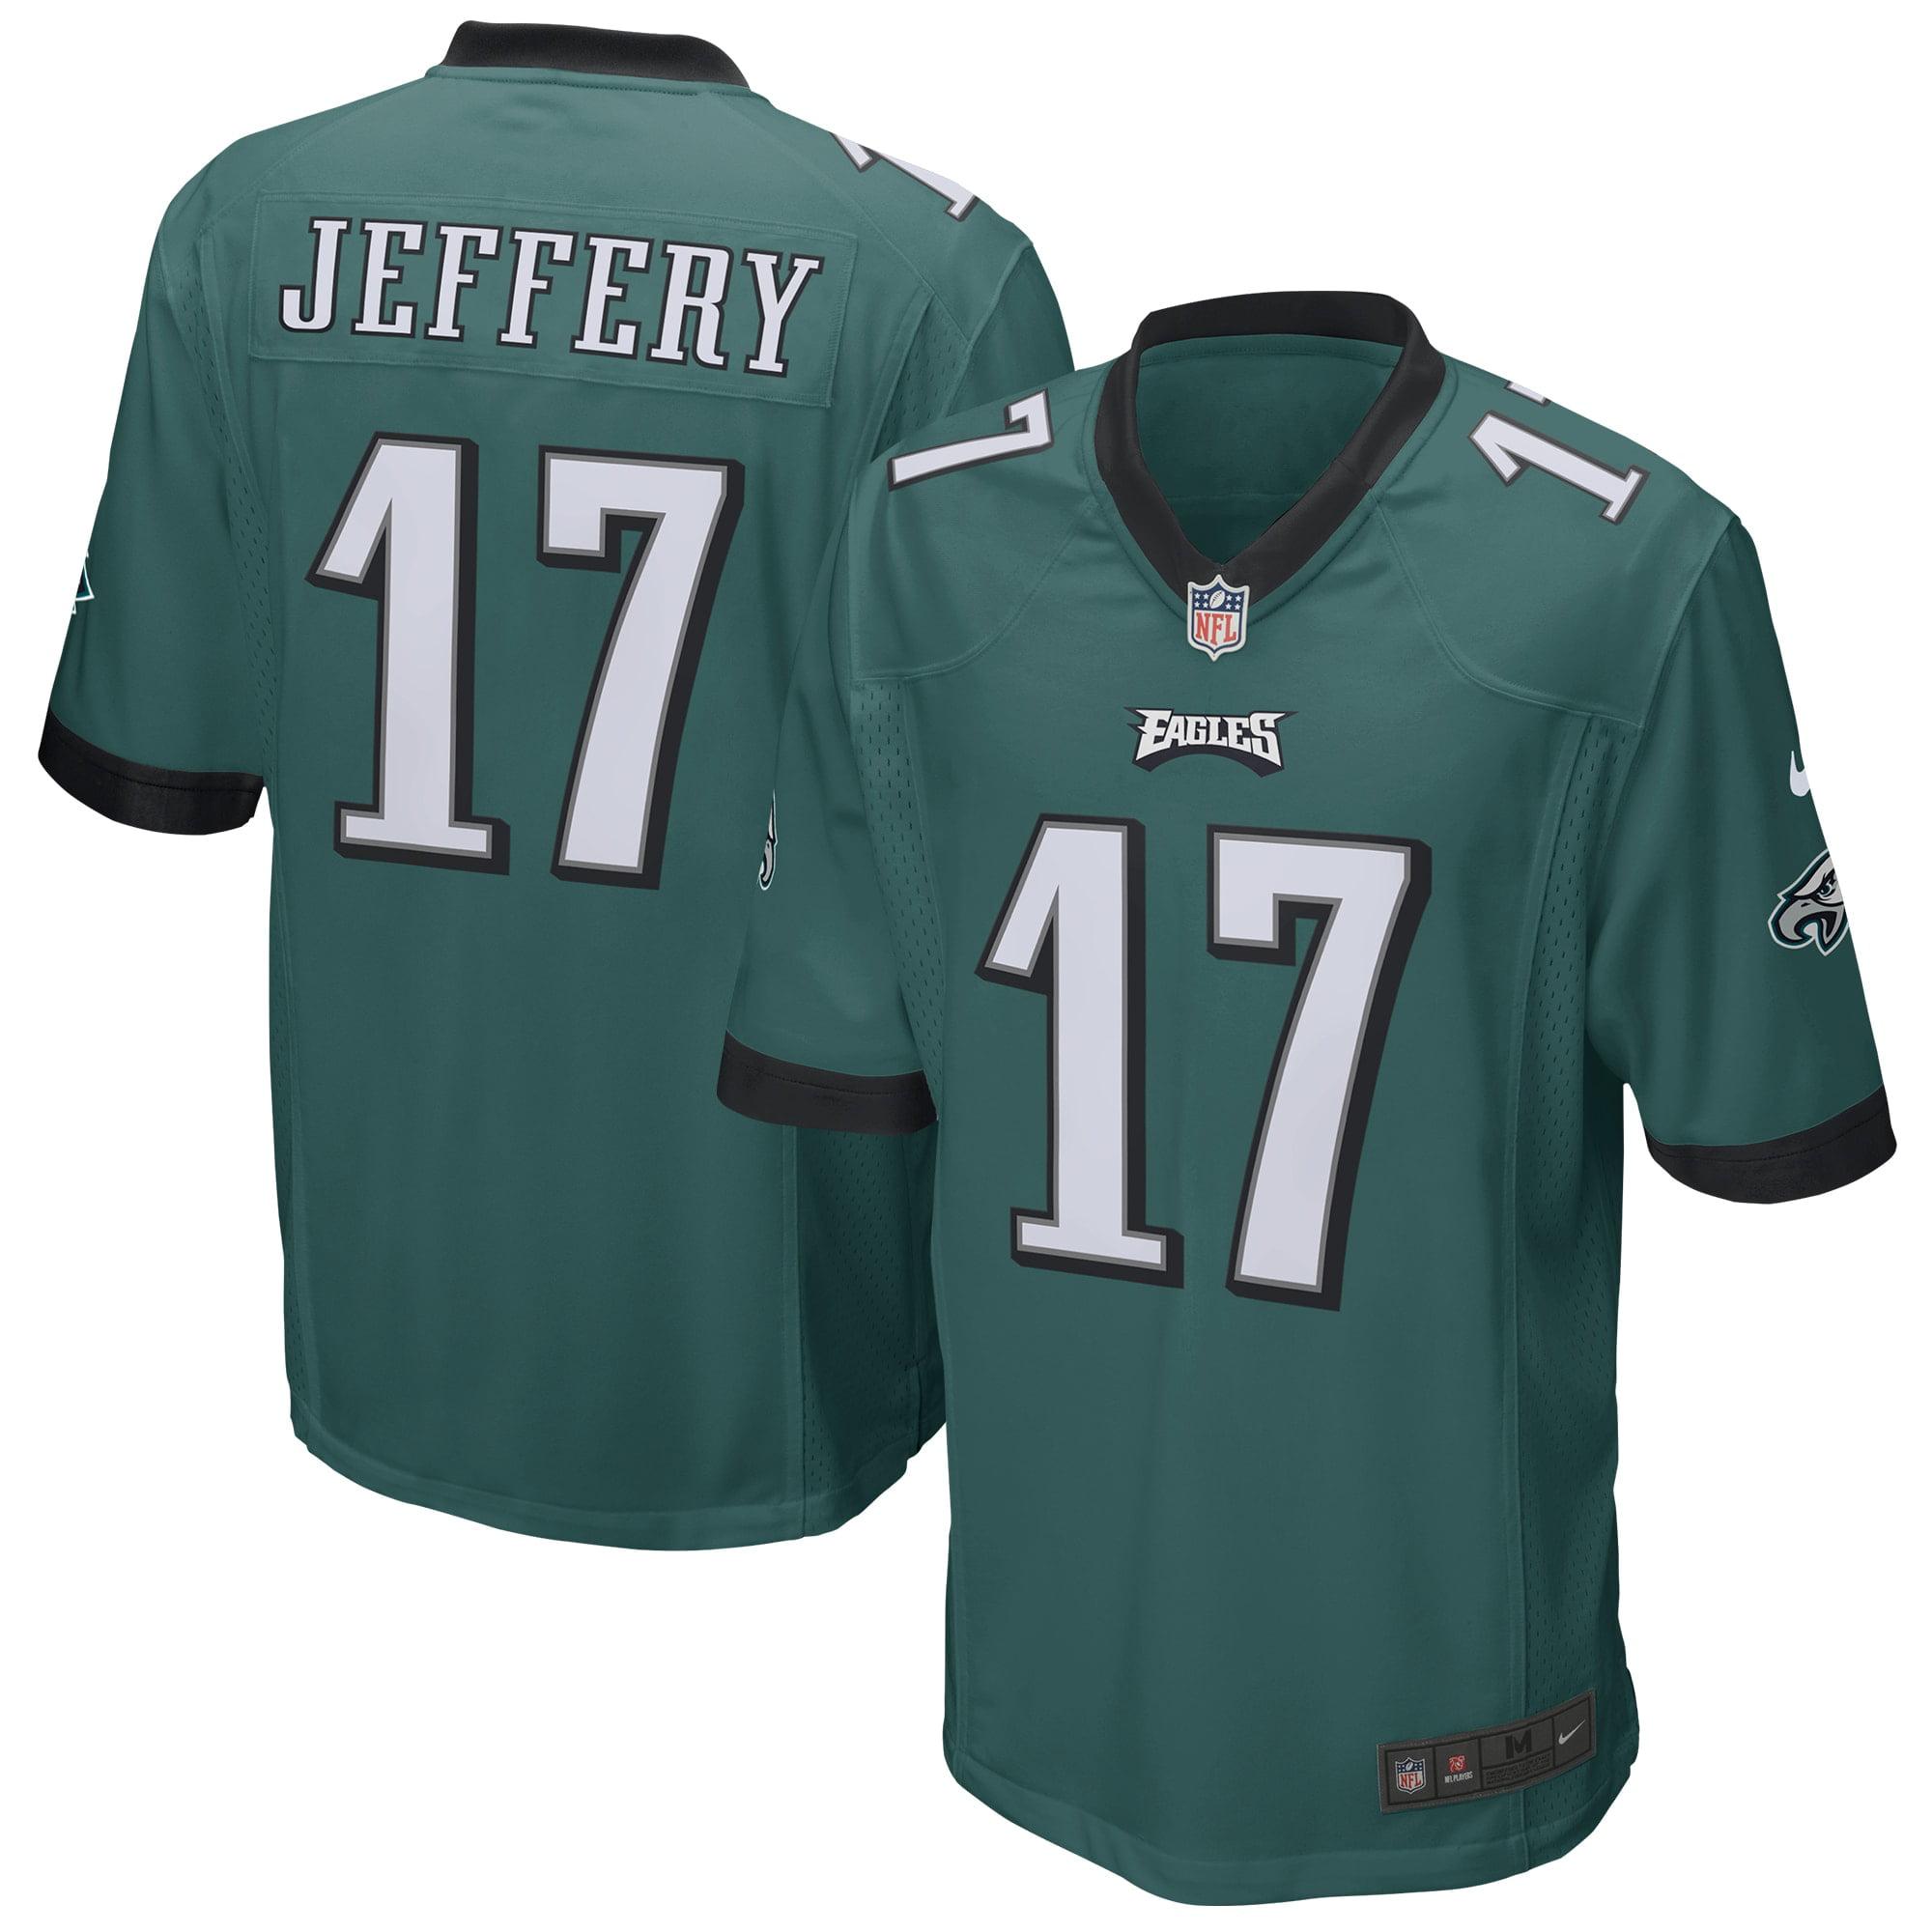 Alshon Jeffery Philadelphia Eagles Nike Game Jersey - Midnight Green - Walmart.com